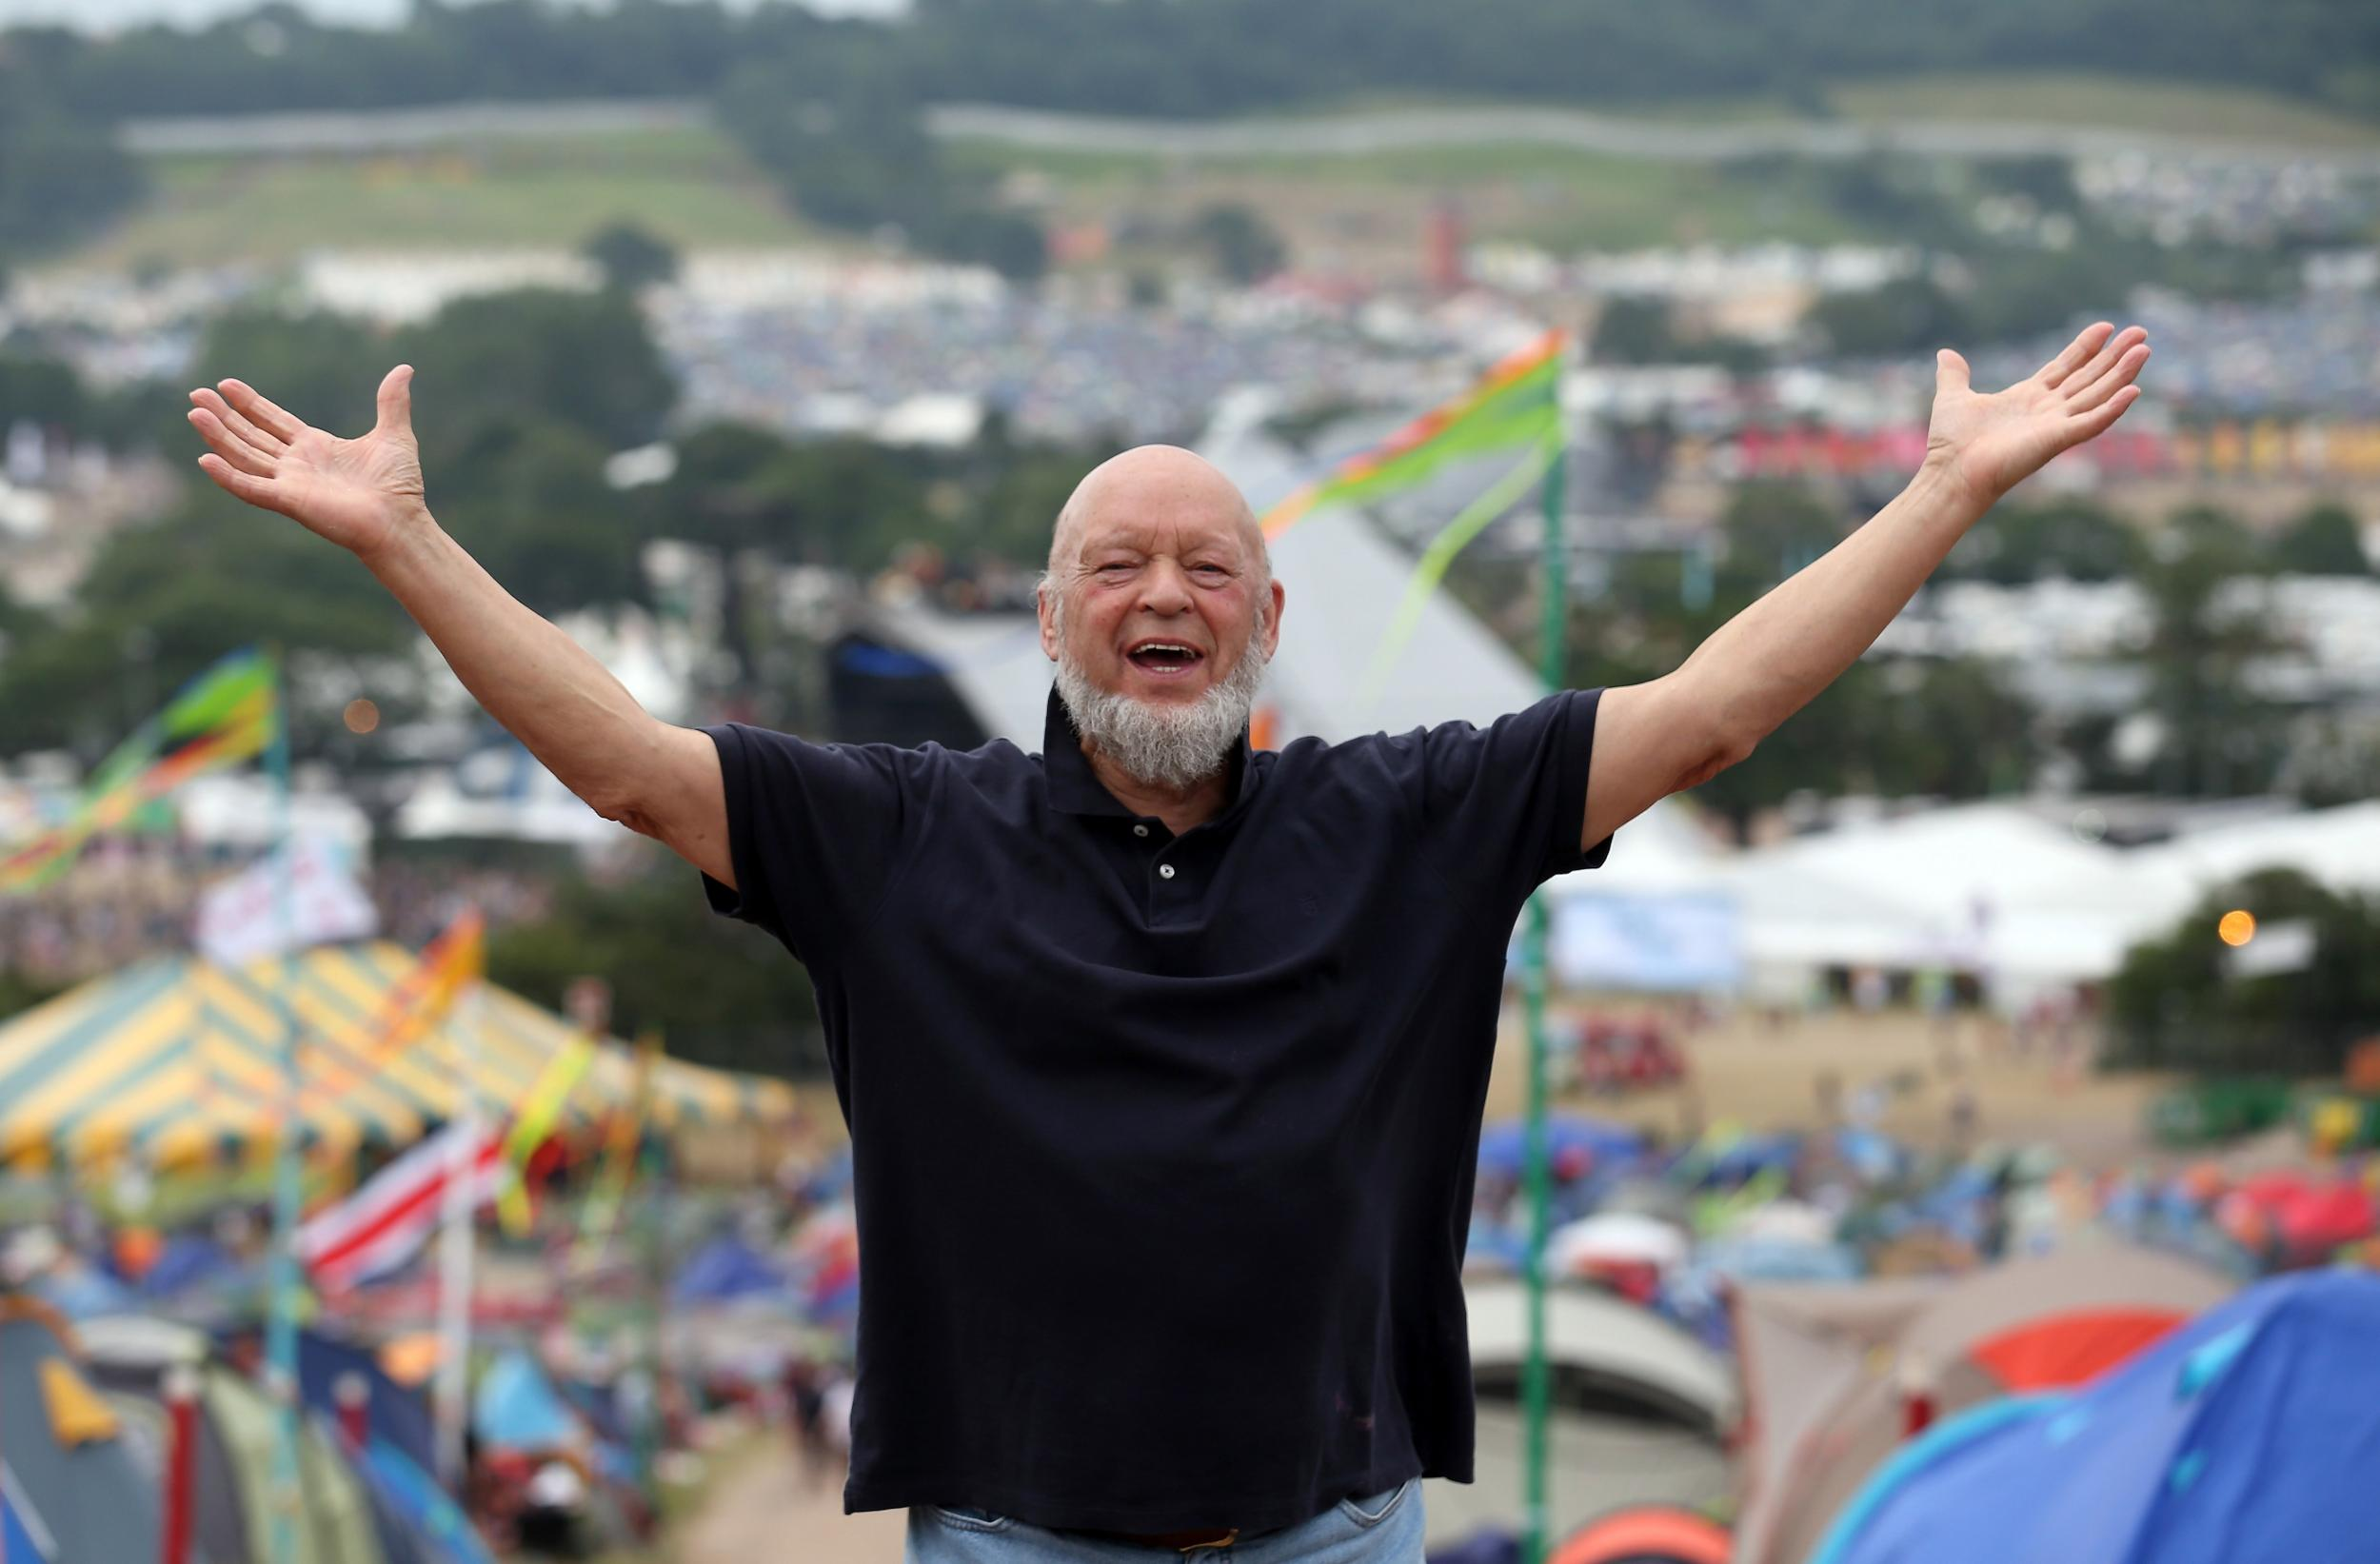 Glastonbury 2017: Pink Floyd rumours surface, new area announced